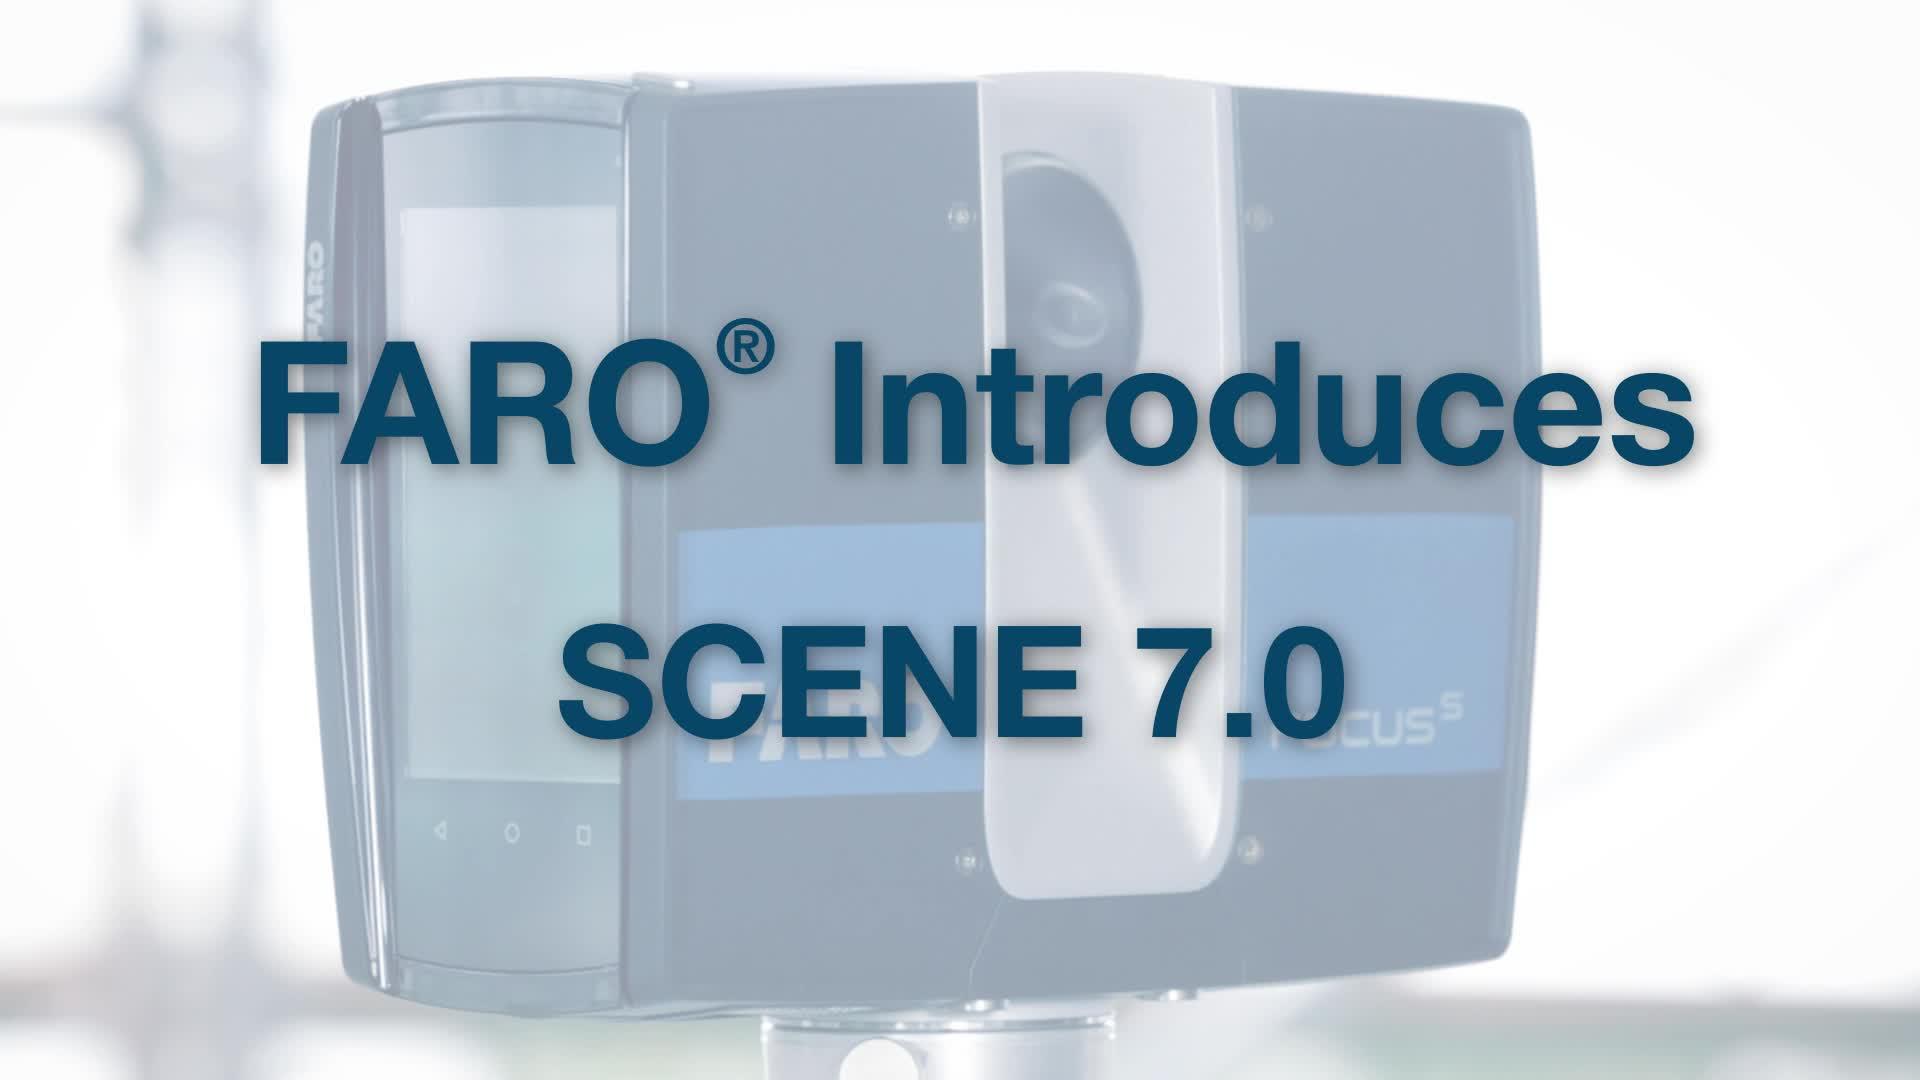 FARO SCENE 7.0 - Real time, on-site registration